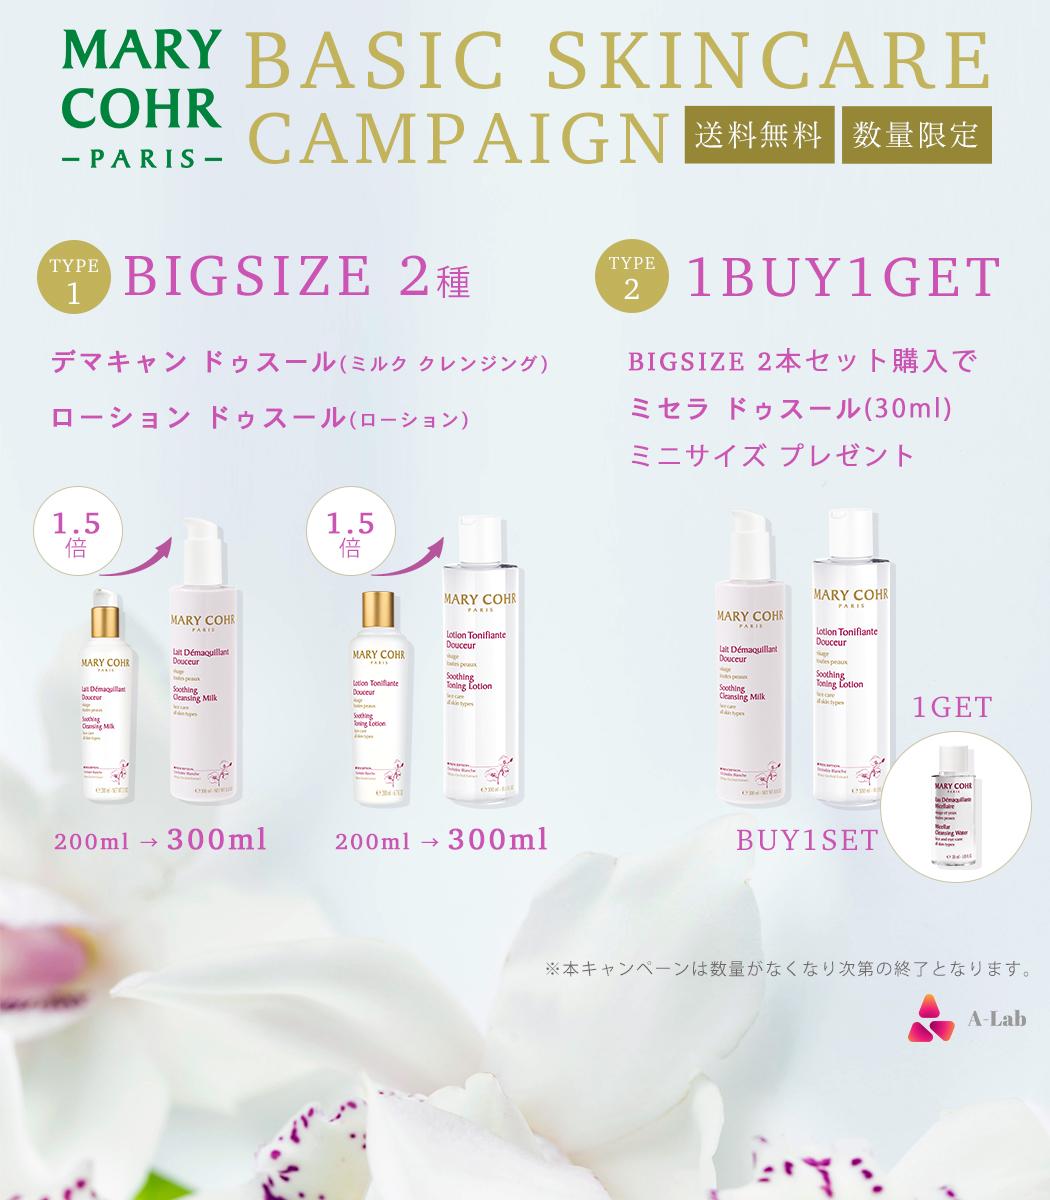 MARY COHR BASIC SKIN CARE キャンペーン